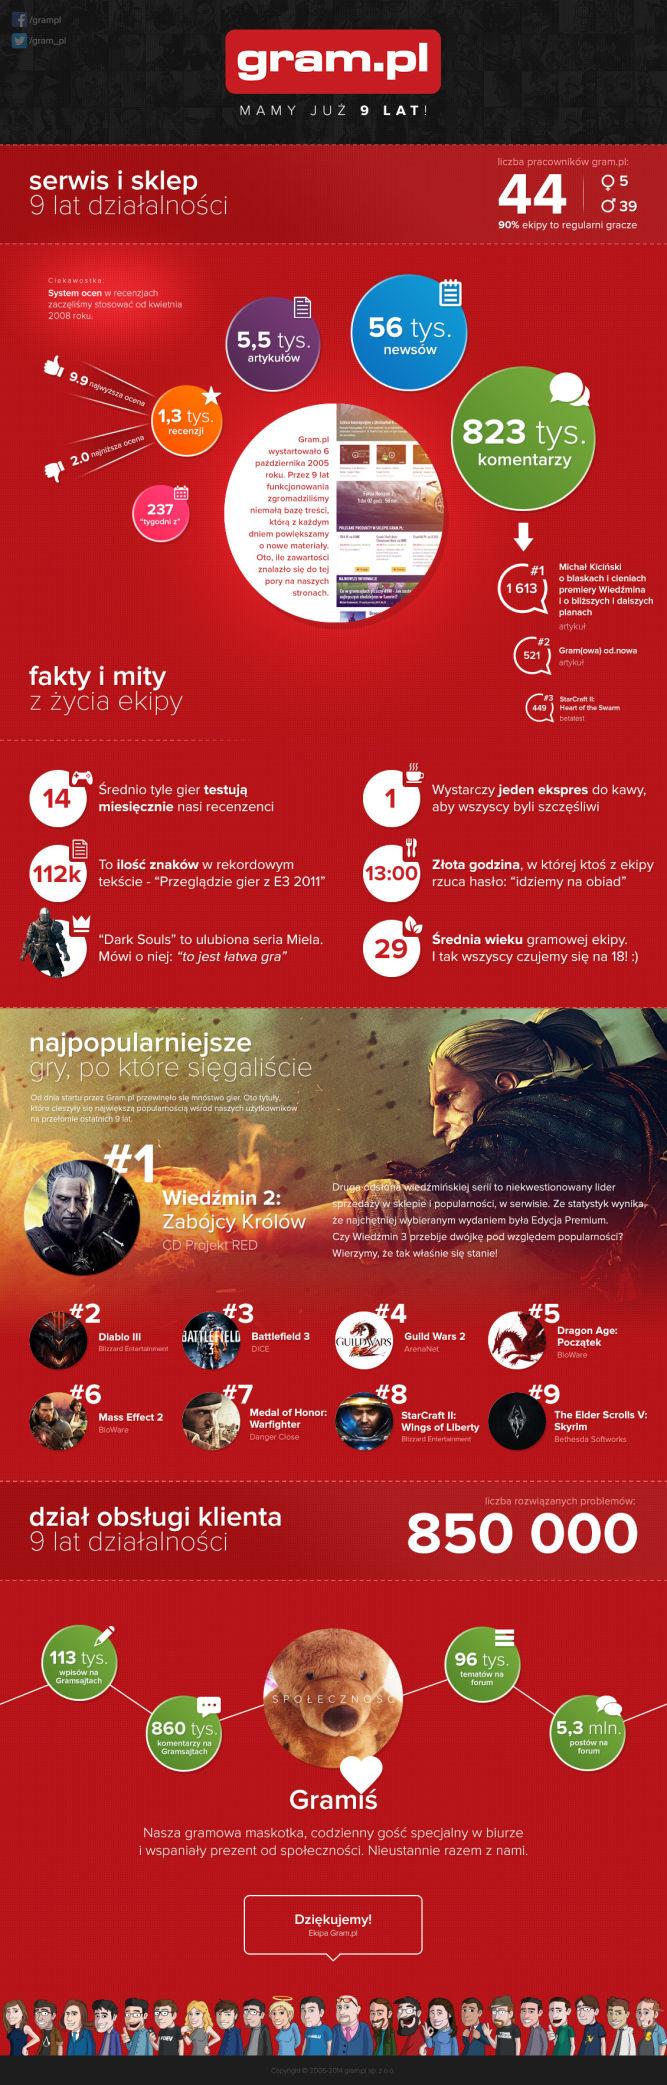 Infografika na 9. urodziny gram.pl - obrazek 1